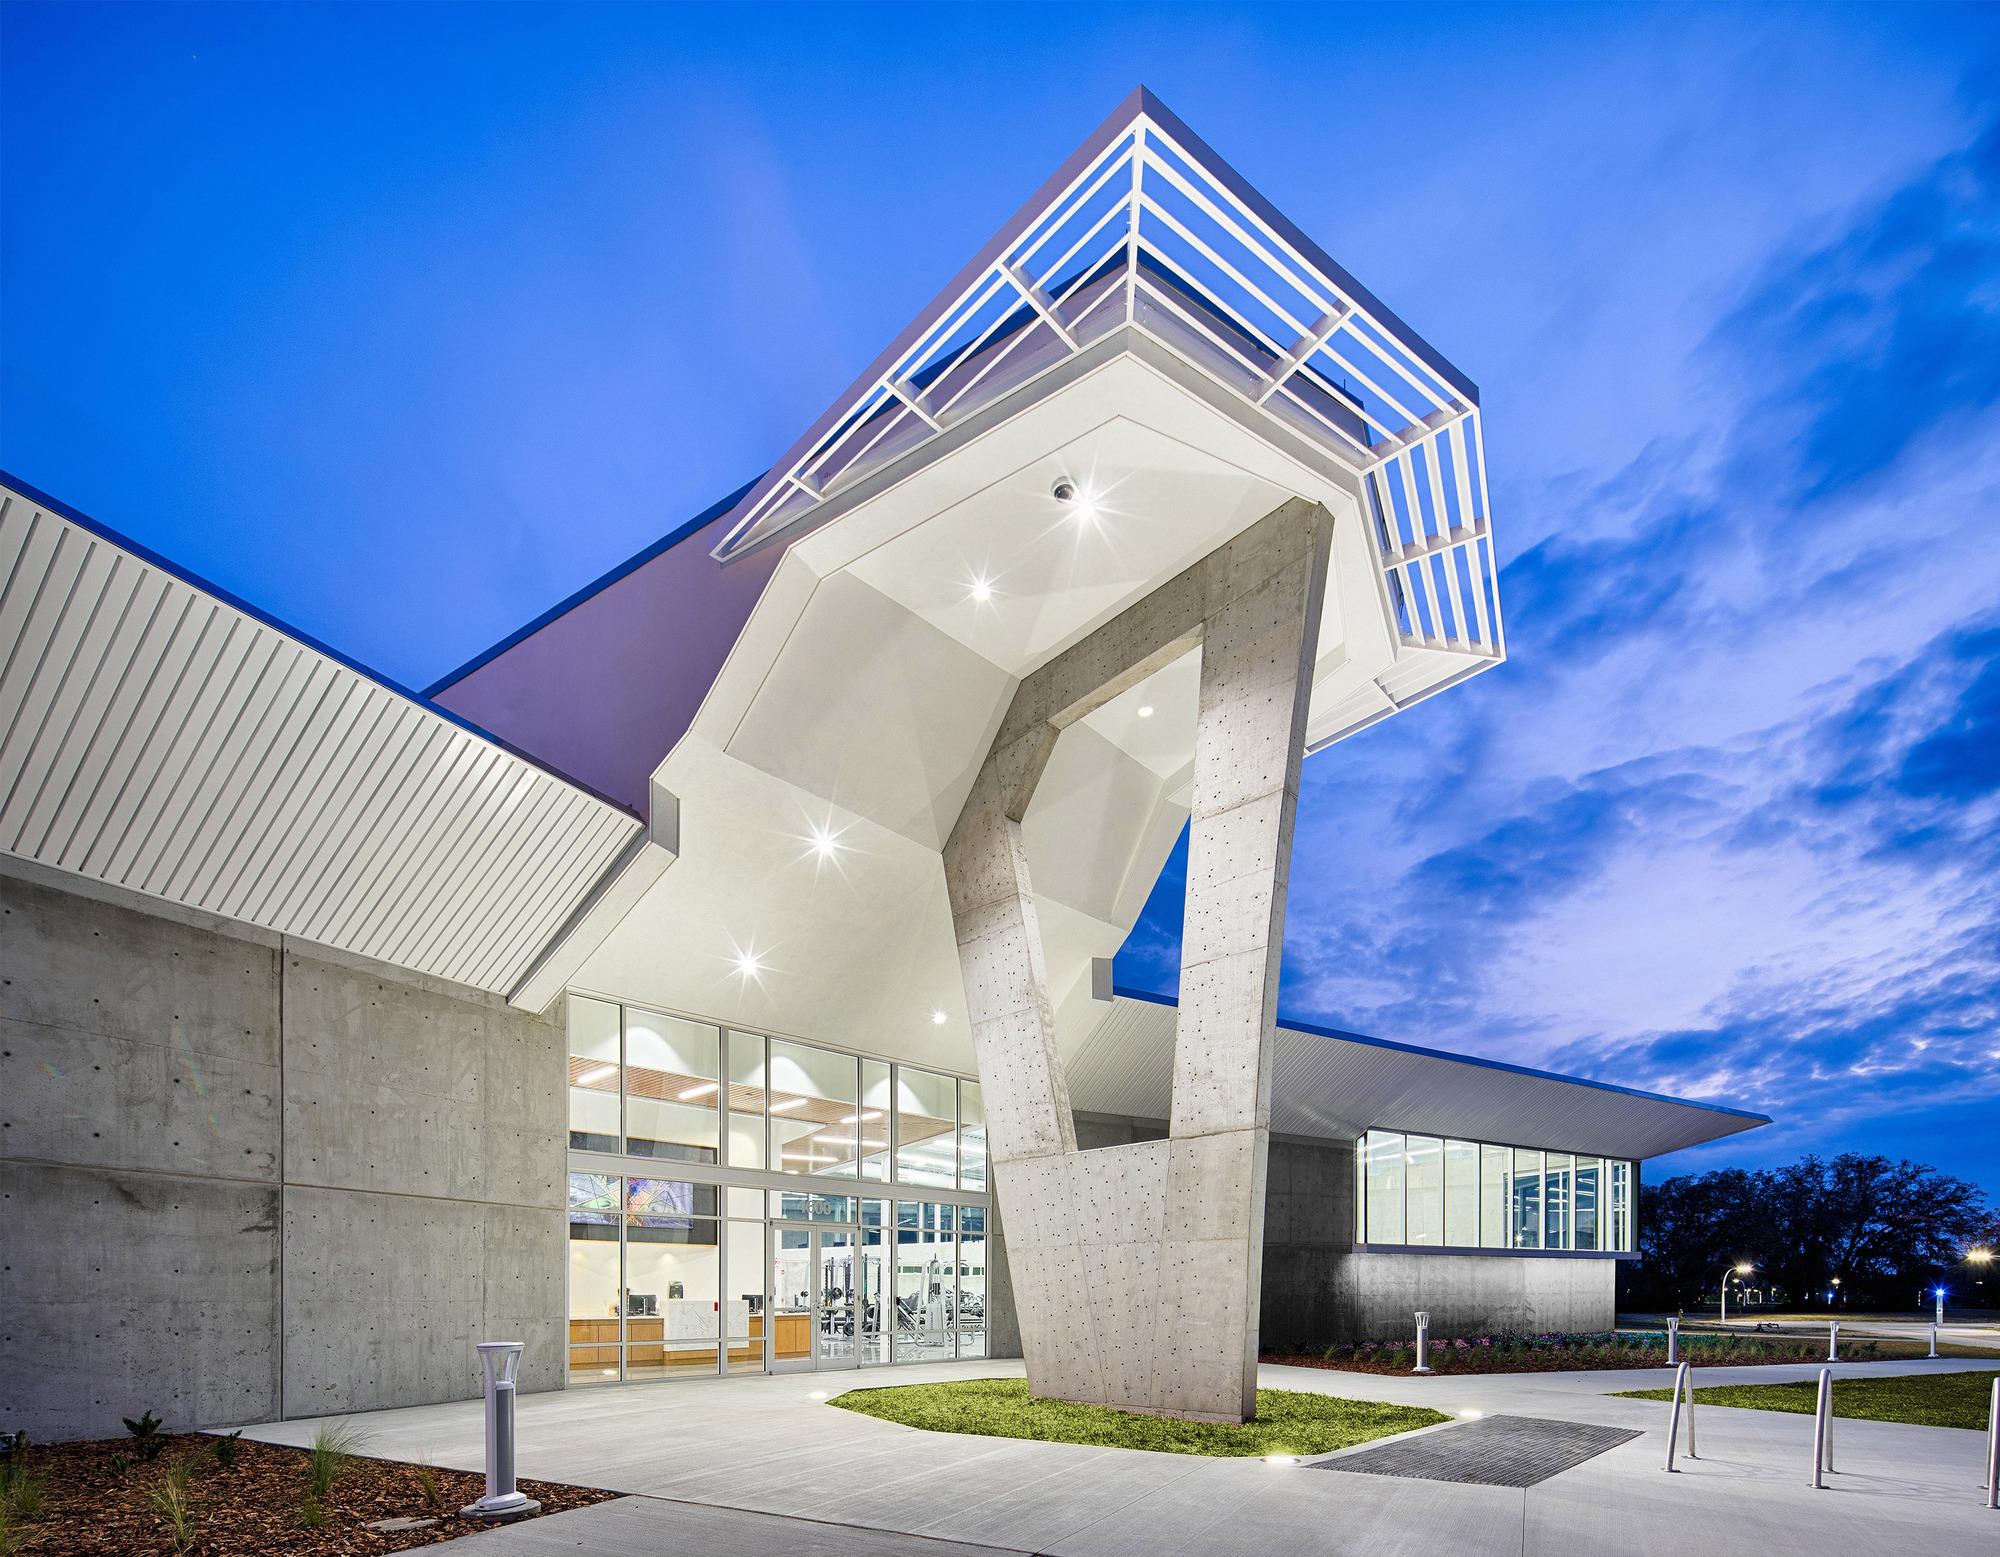 Florida Polytechnic University Student Development Center / Straughn Trout Architect